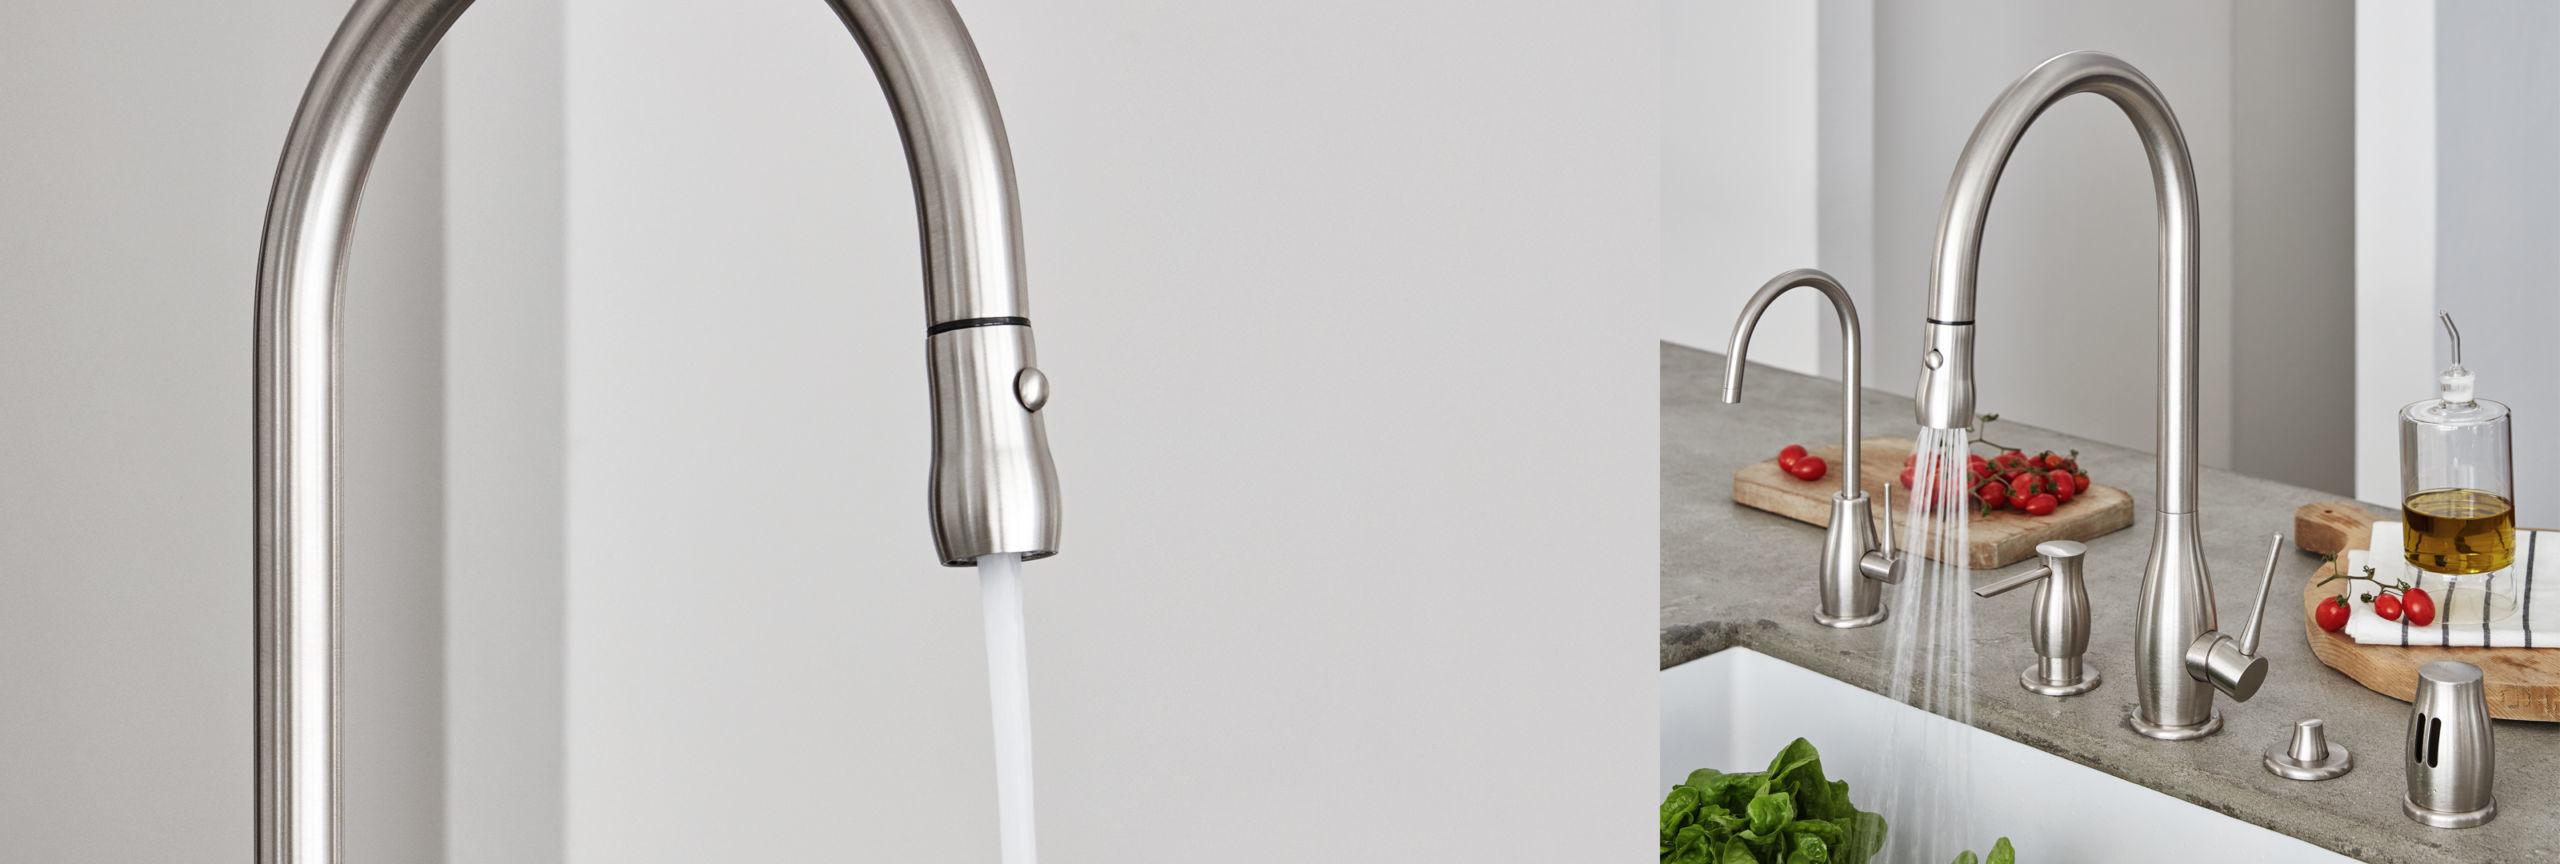 Rosolina - California Faucets